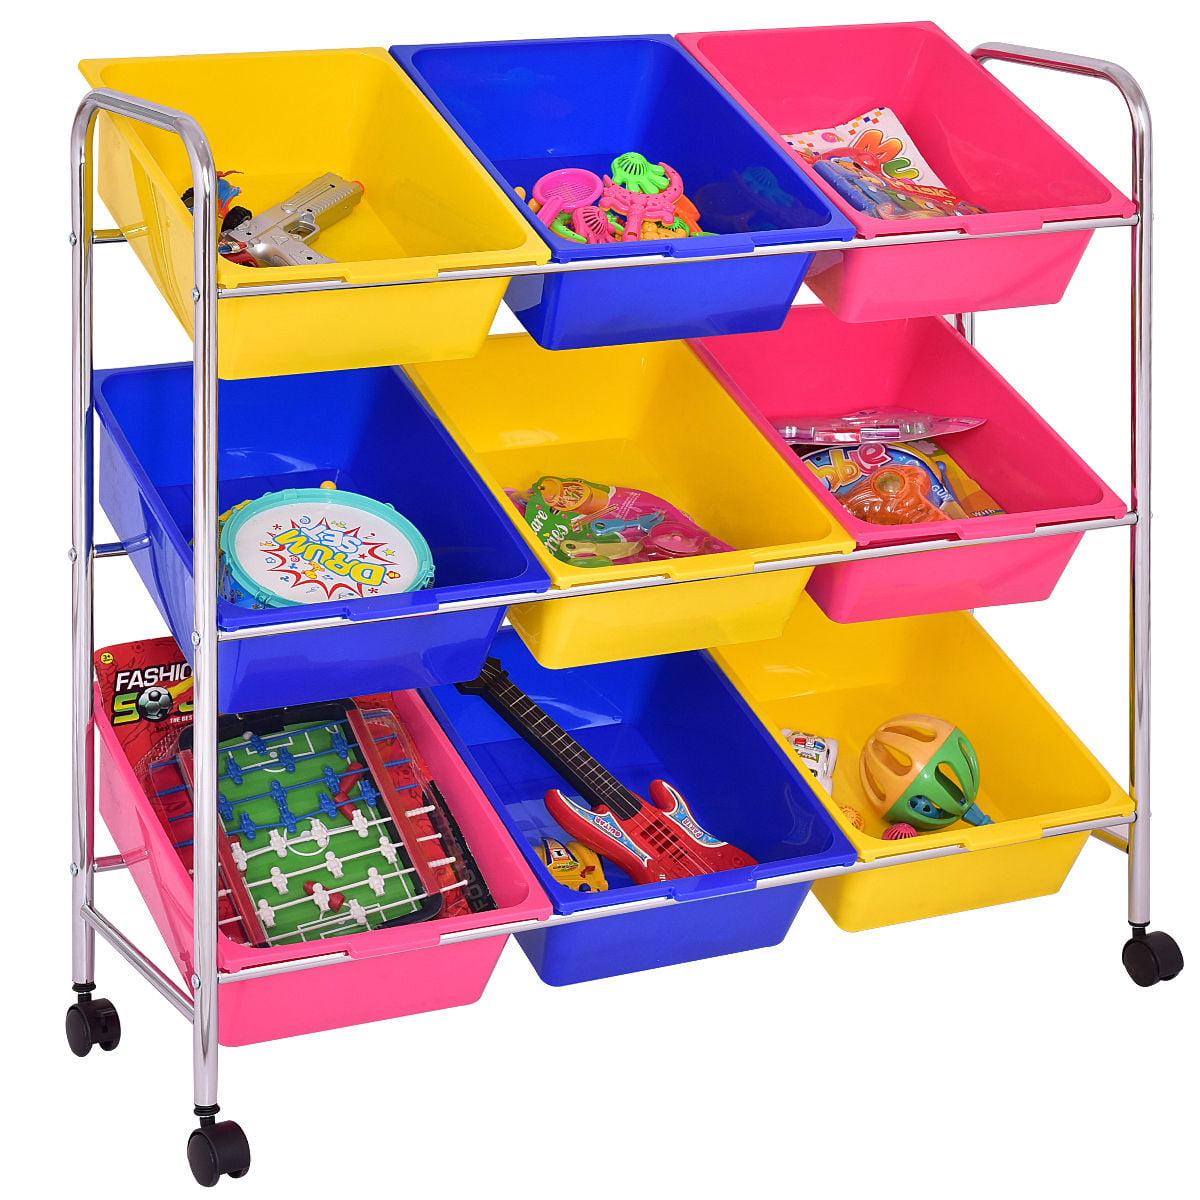 Costway Kids Toy Storage Shelf Organizer 9 Bins, Multi-colored Bin Cart ,Playroom